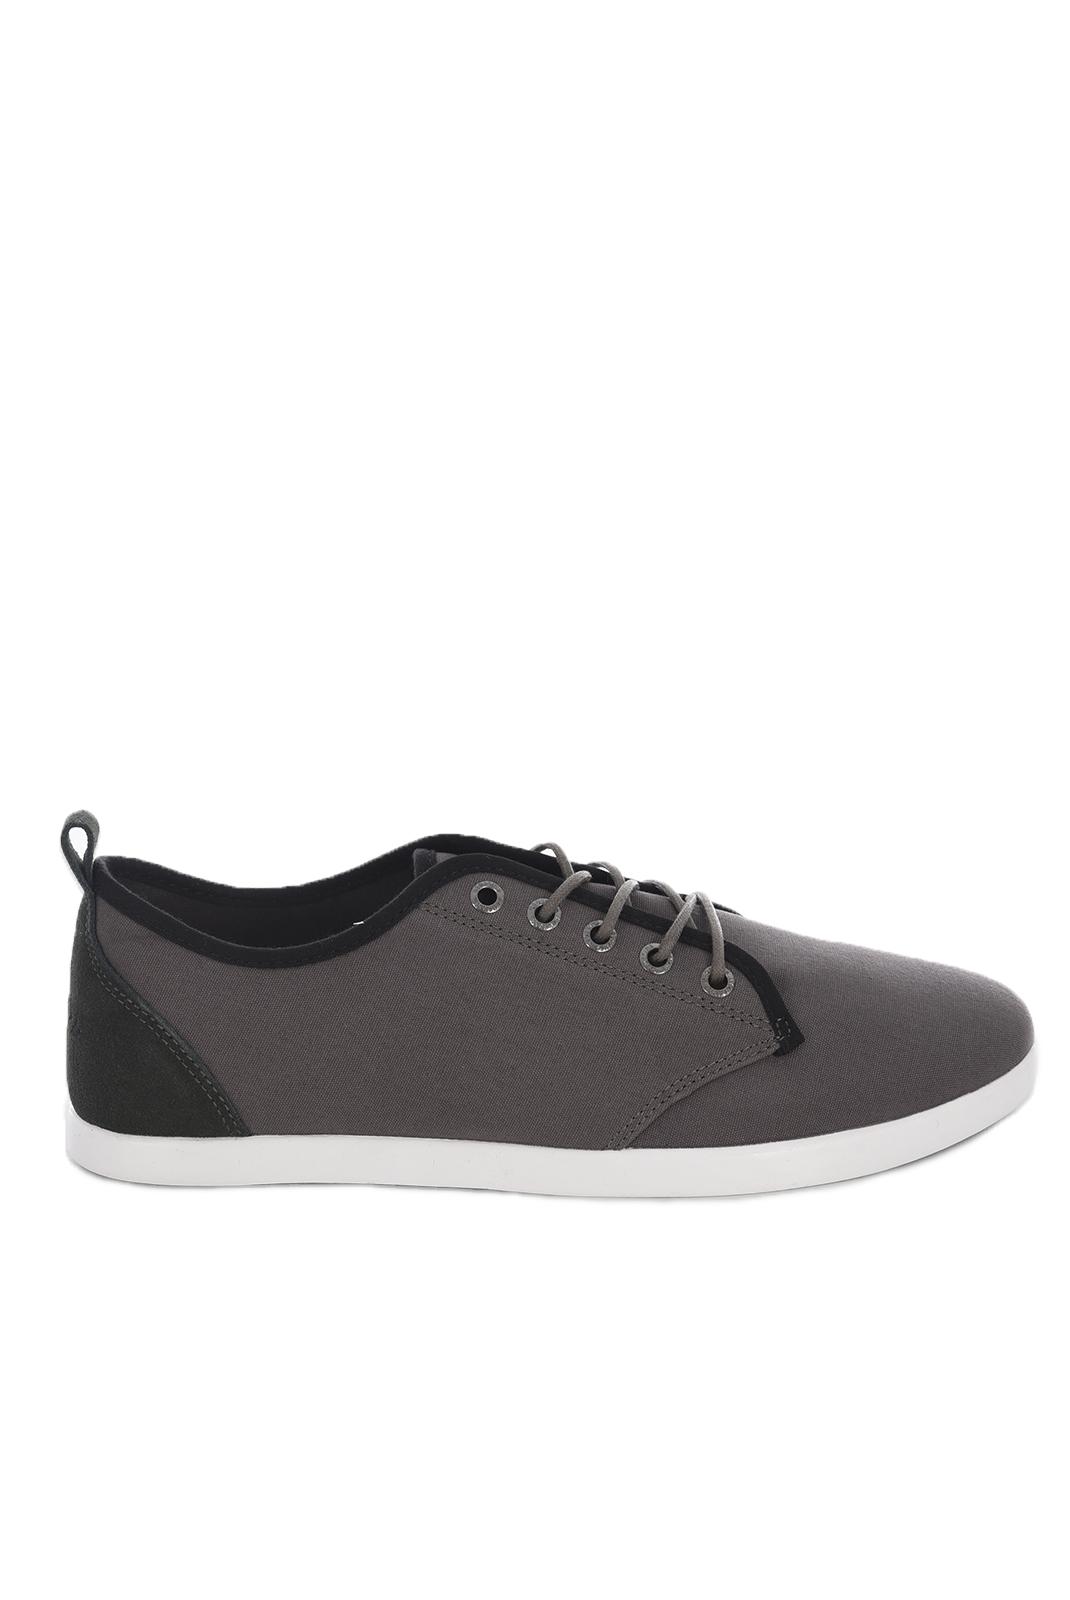 Chaussures   Redskins ZIGOMA GRIS NOIR